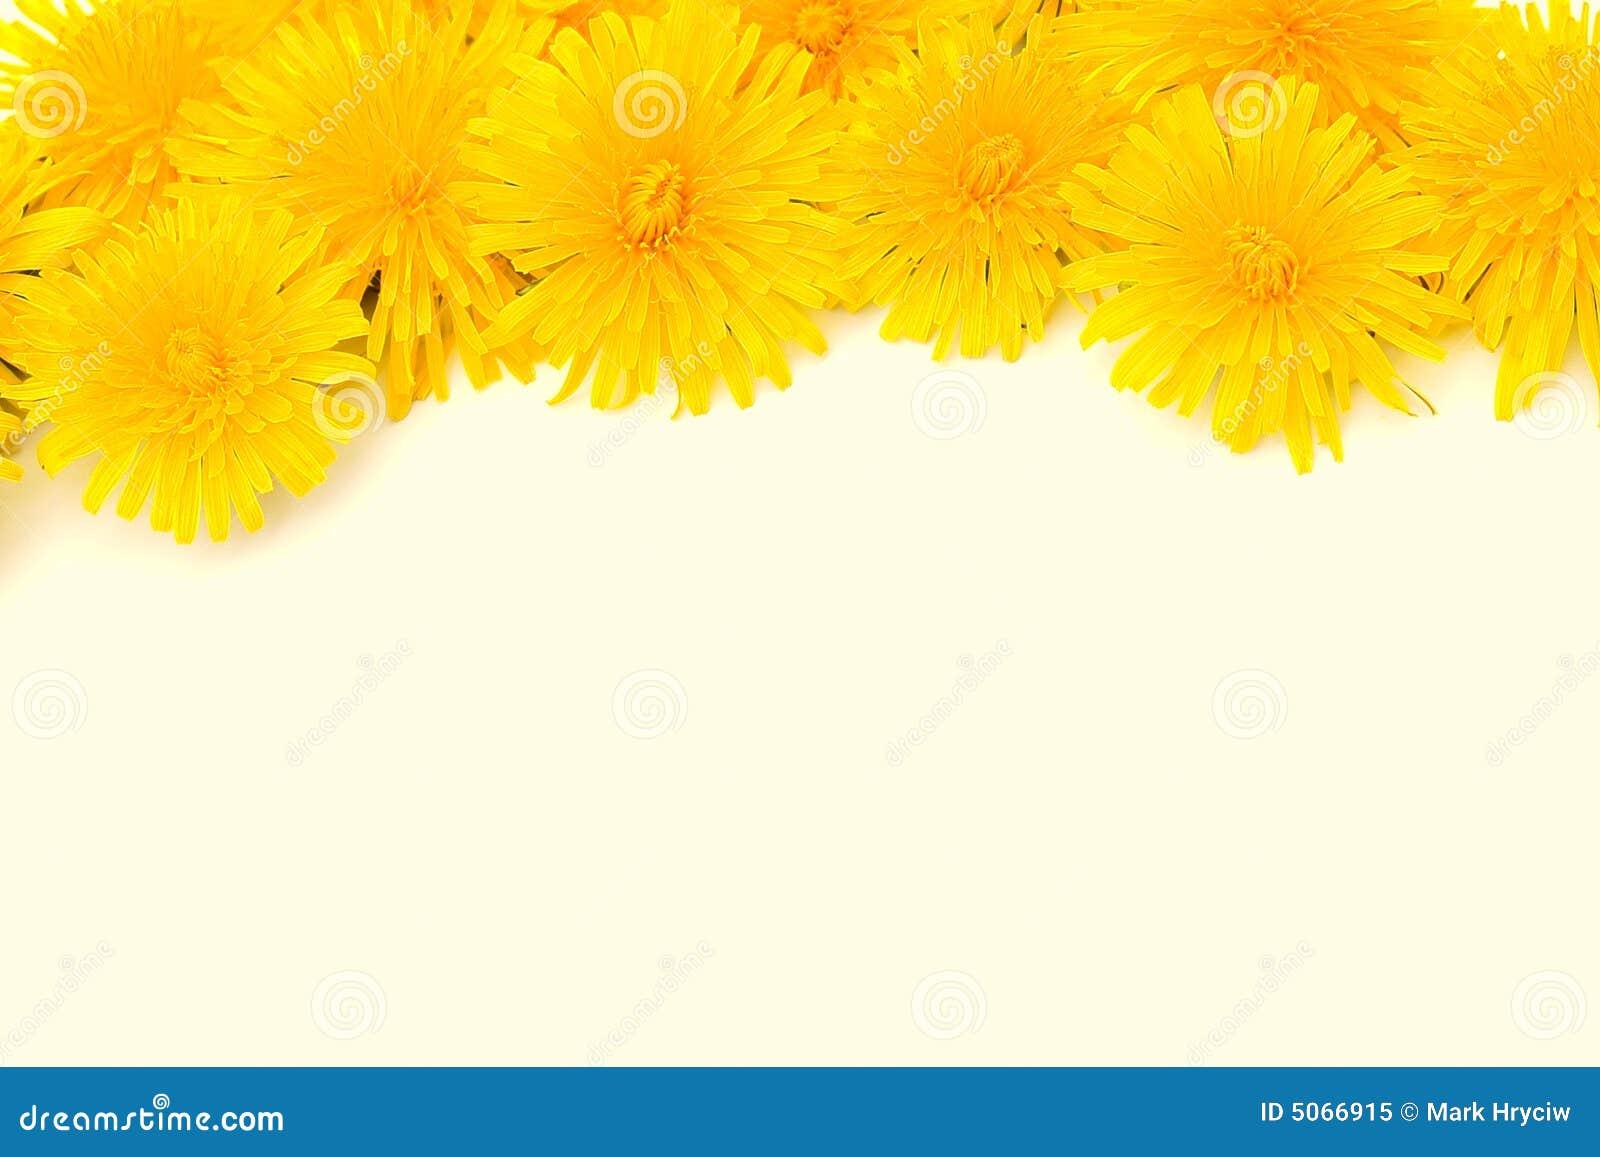 Yellow Flower Border Isolated Royalty Free Stock Photo - Image ...